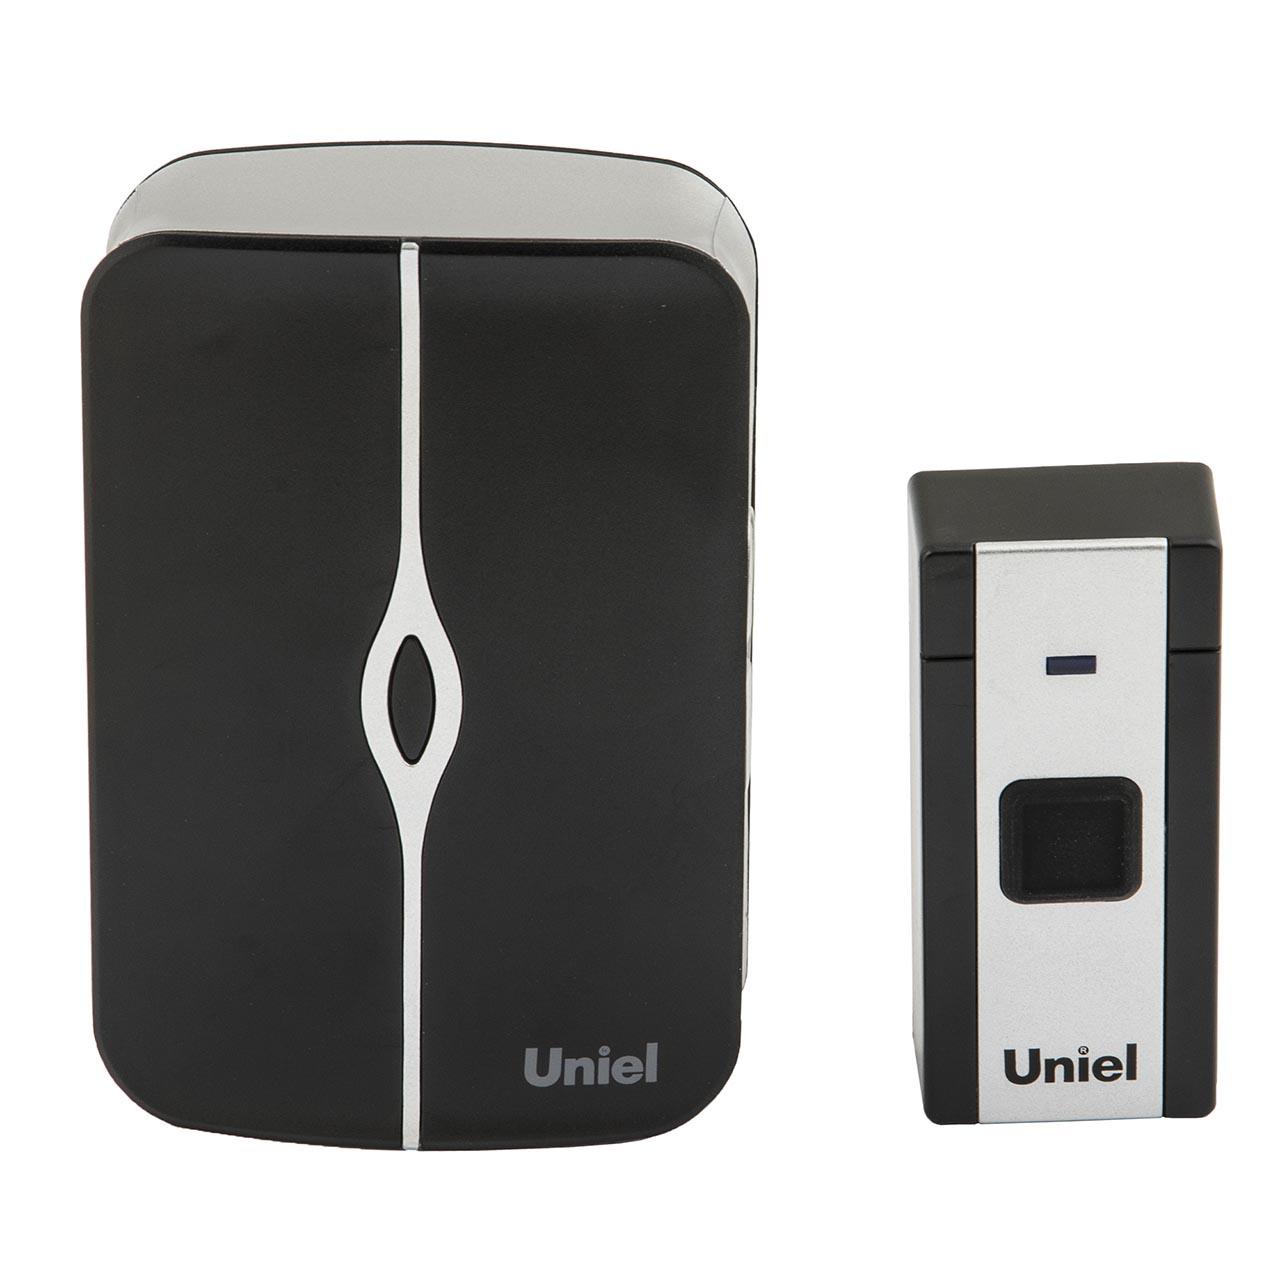 Звонок беспроводной Uniel udb-015w-r1t1-36s